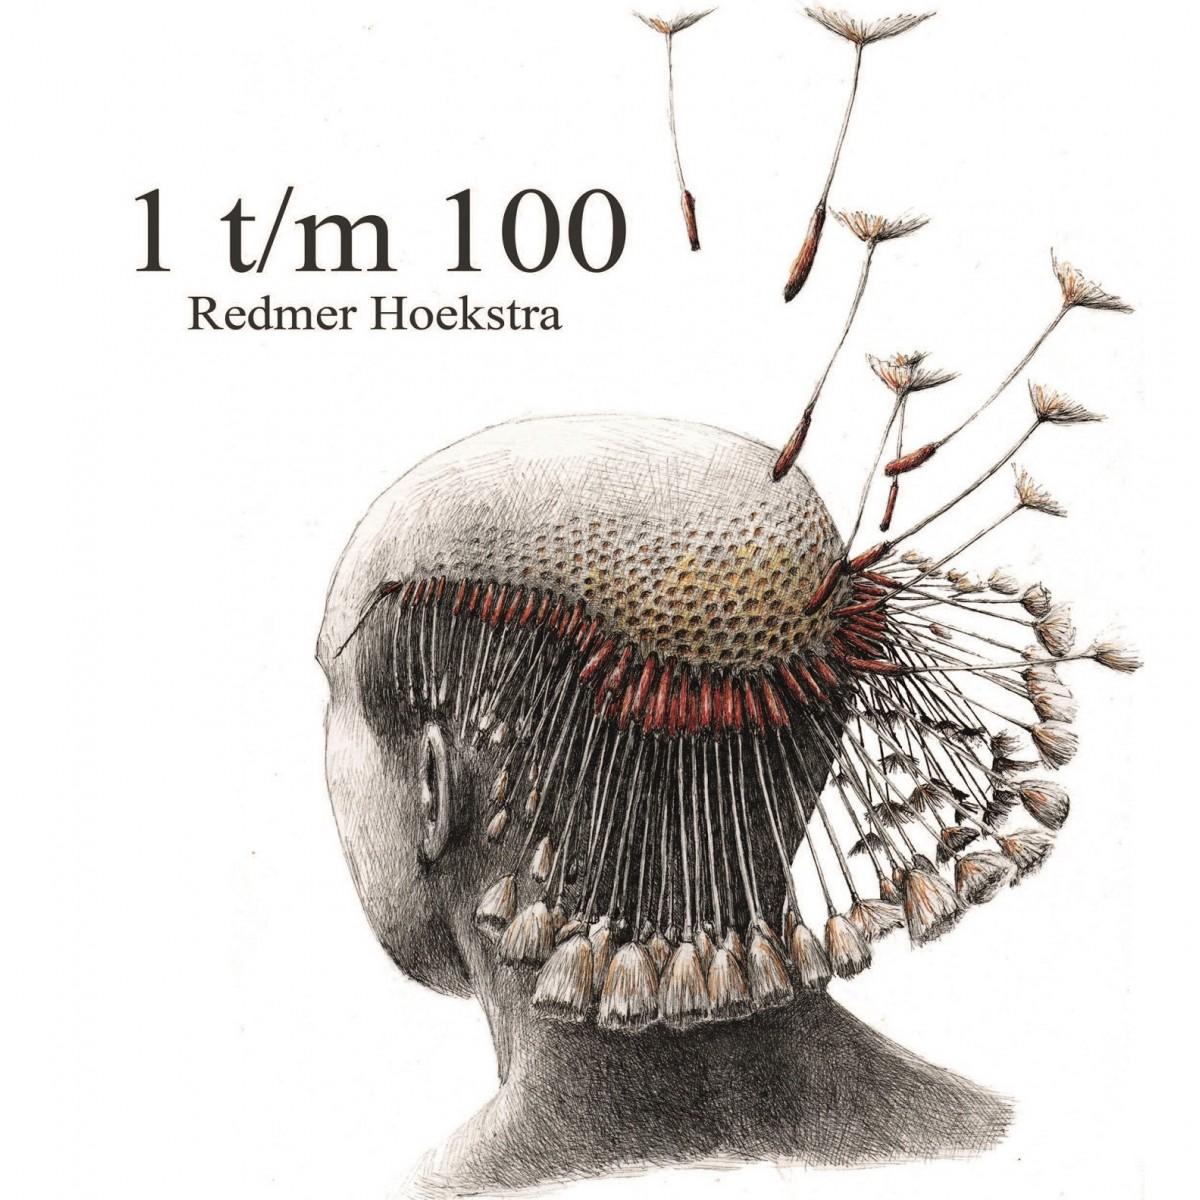 HOEKSTRA Redmer - 1 t/m 100 - Signé